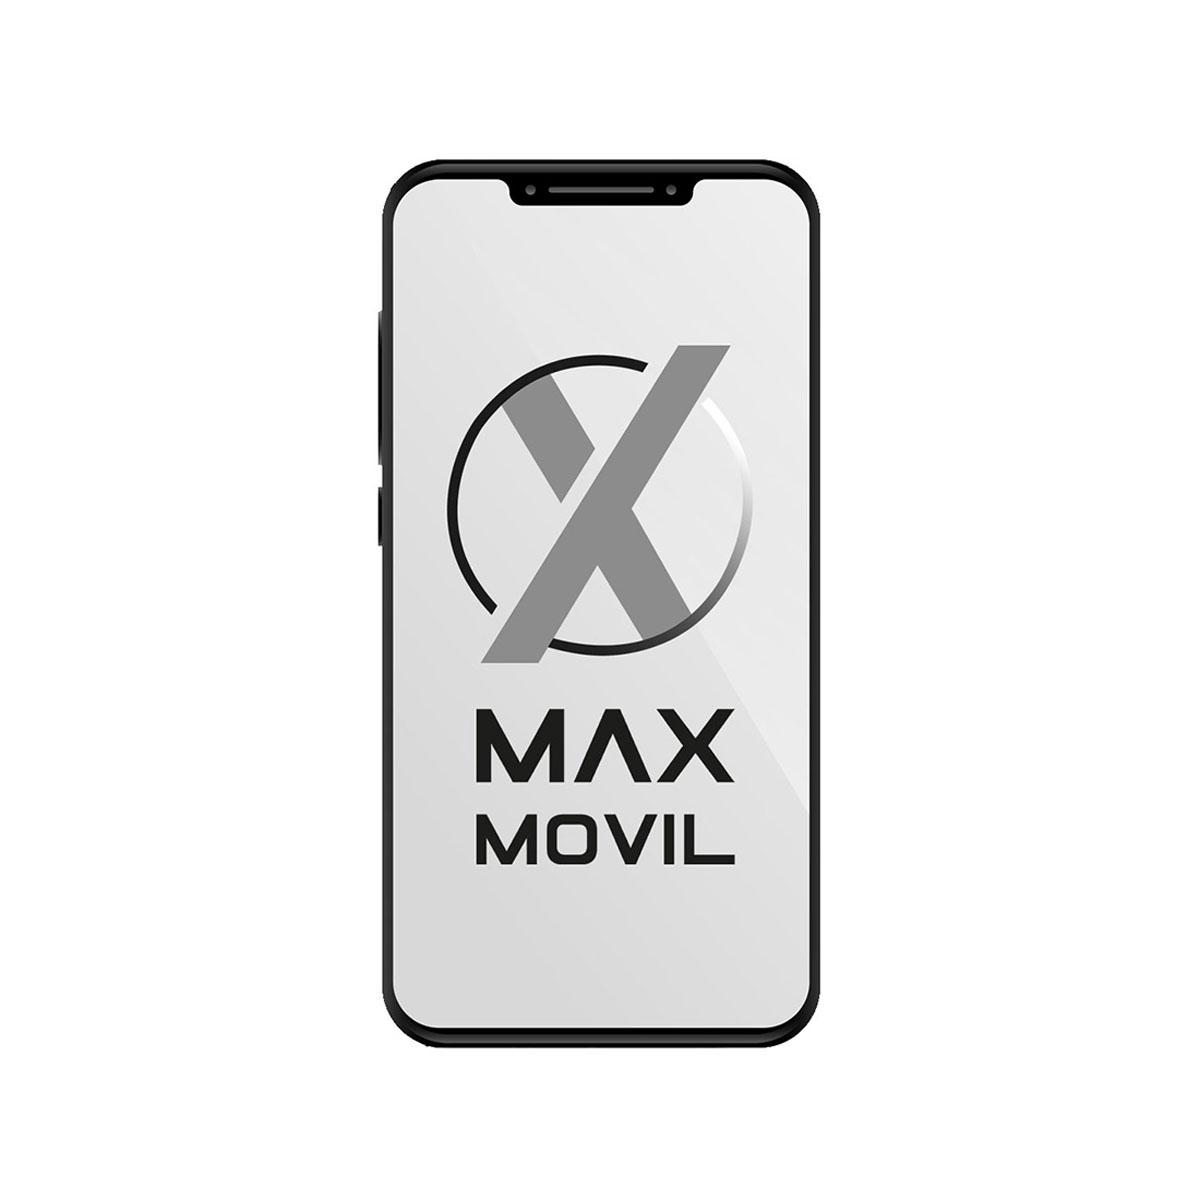 Funda de silicona para apple iphone 5 maxmovil - Fundas de silicona para iphone 5 ...